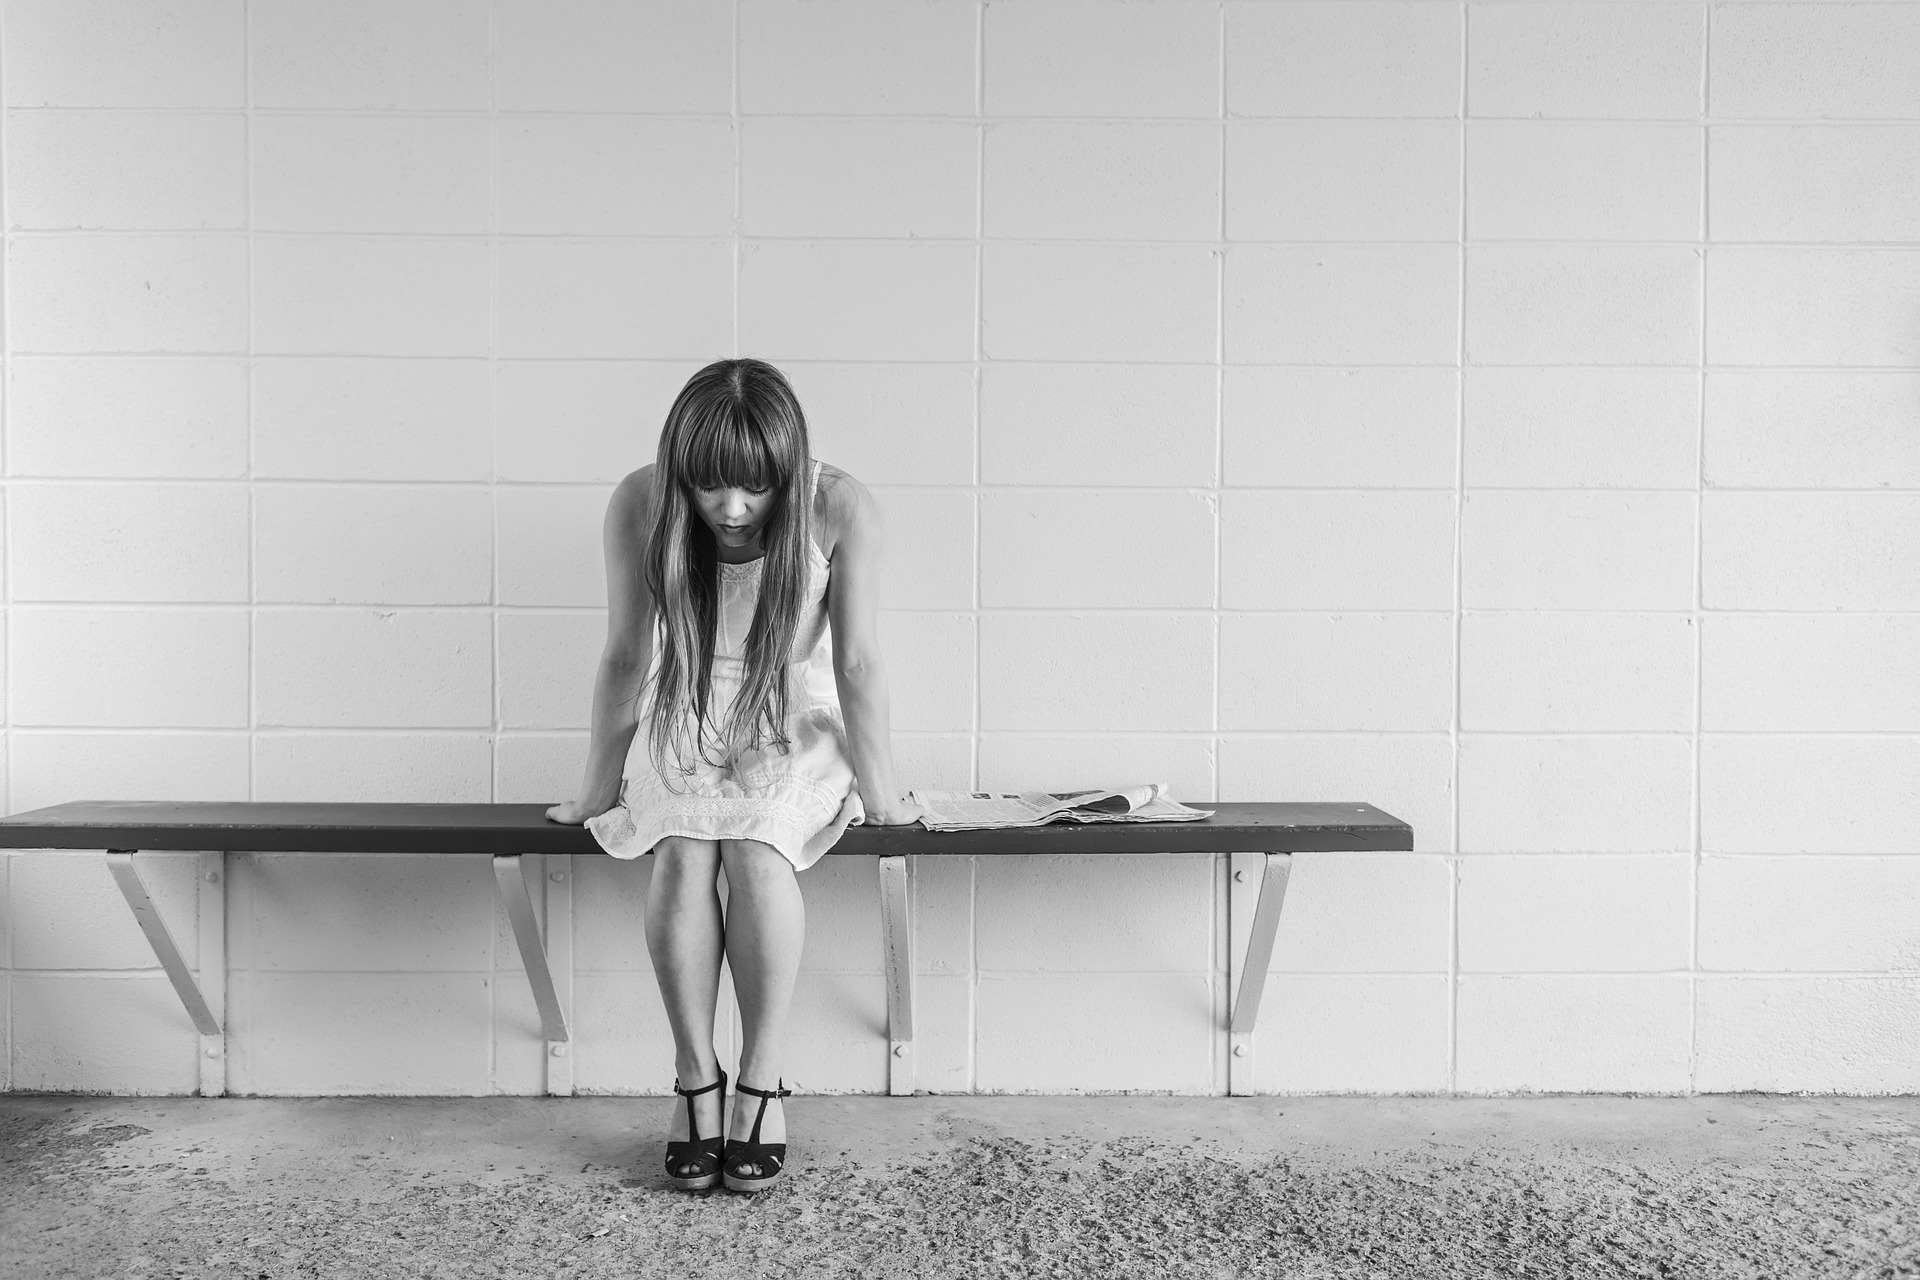 worried-girl-sad